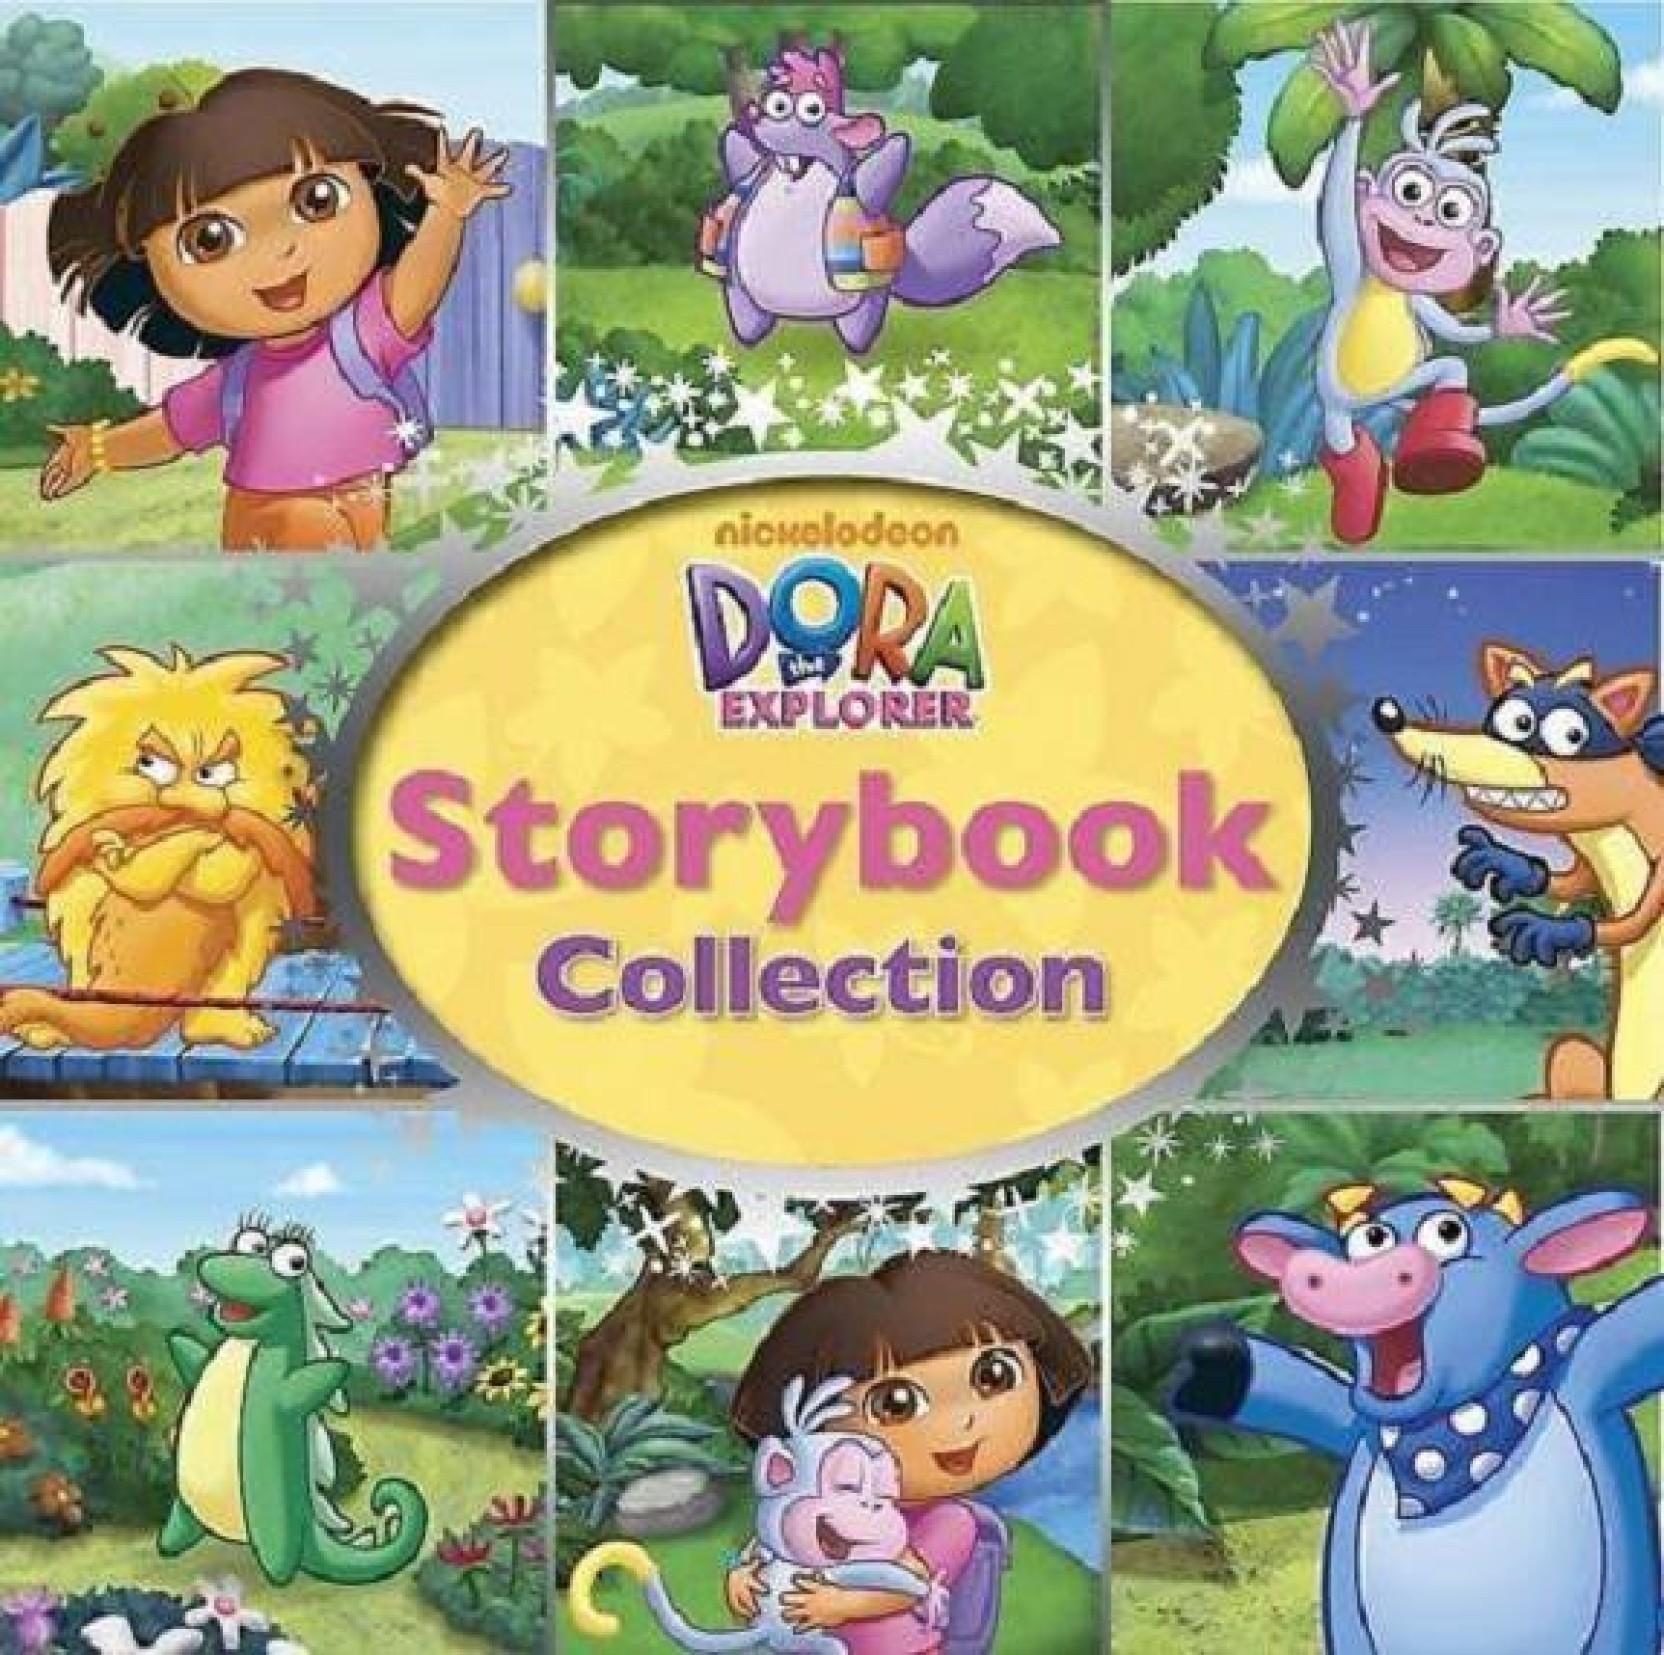 DORA STORY BOOK COLLECTION - 9781472327130: Buy DORA STORY BOOK ...